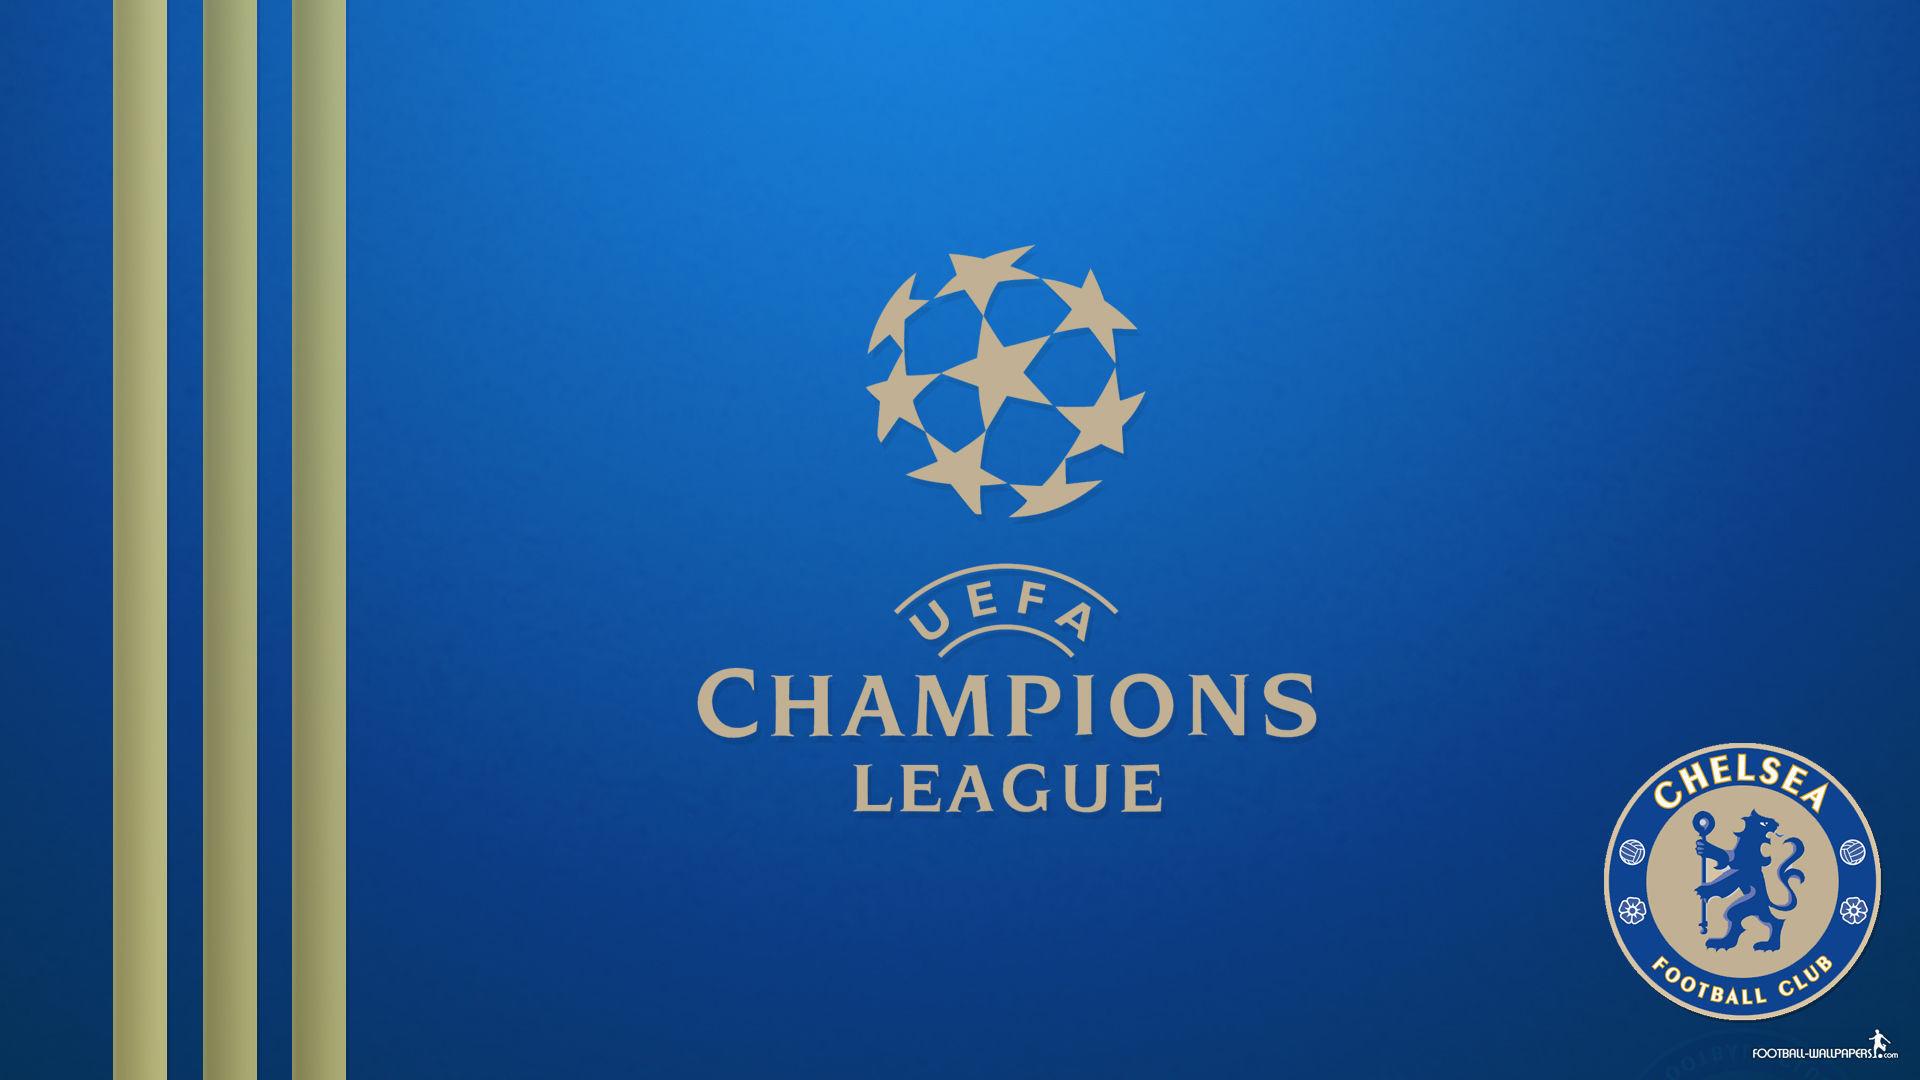 Res: 1920x1080, Chelsea Champions League. Wallpaper ...